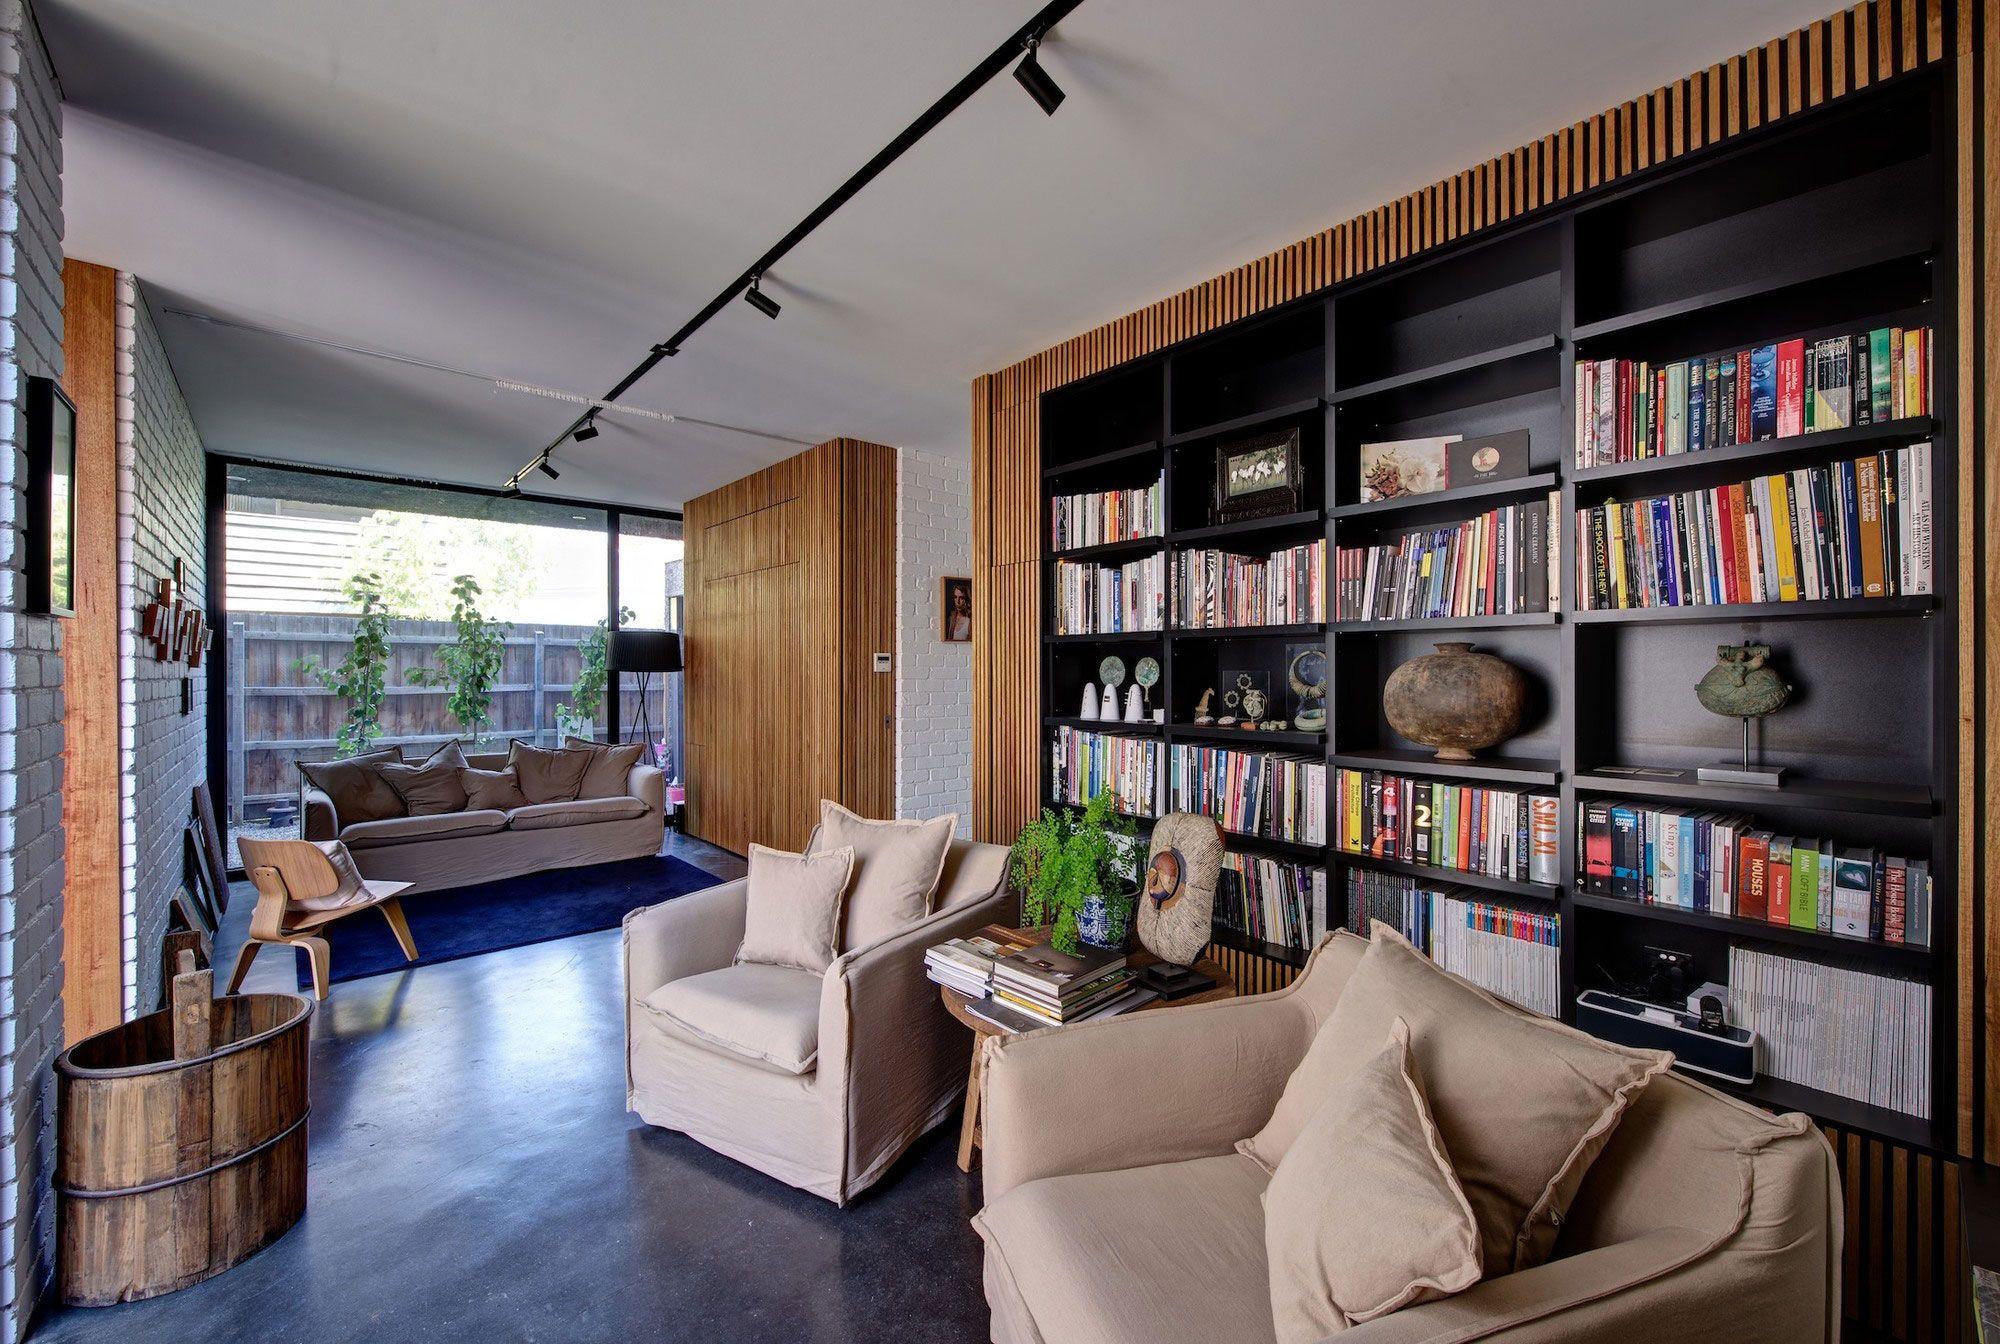 Energy Efficient Home Design by Jessica Liew   Founterior